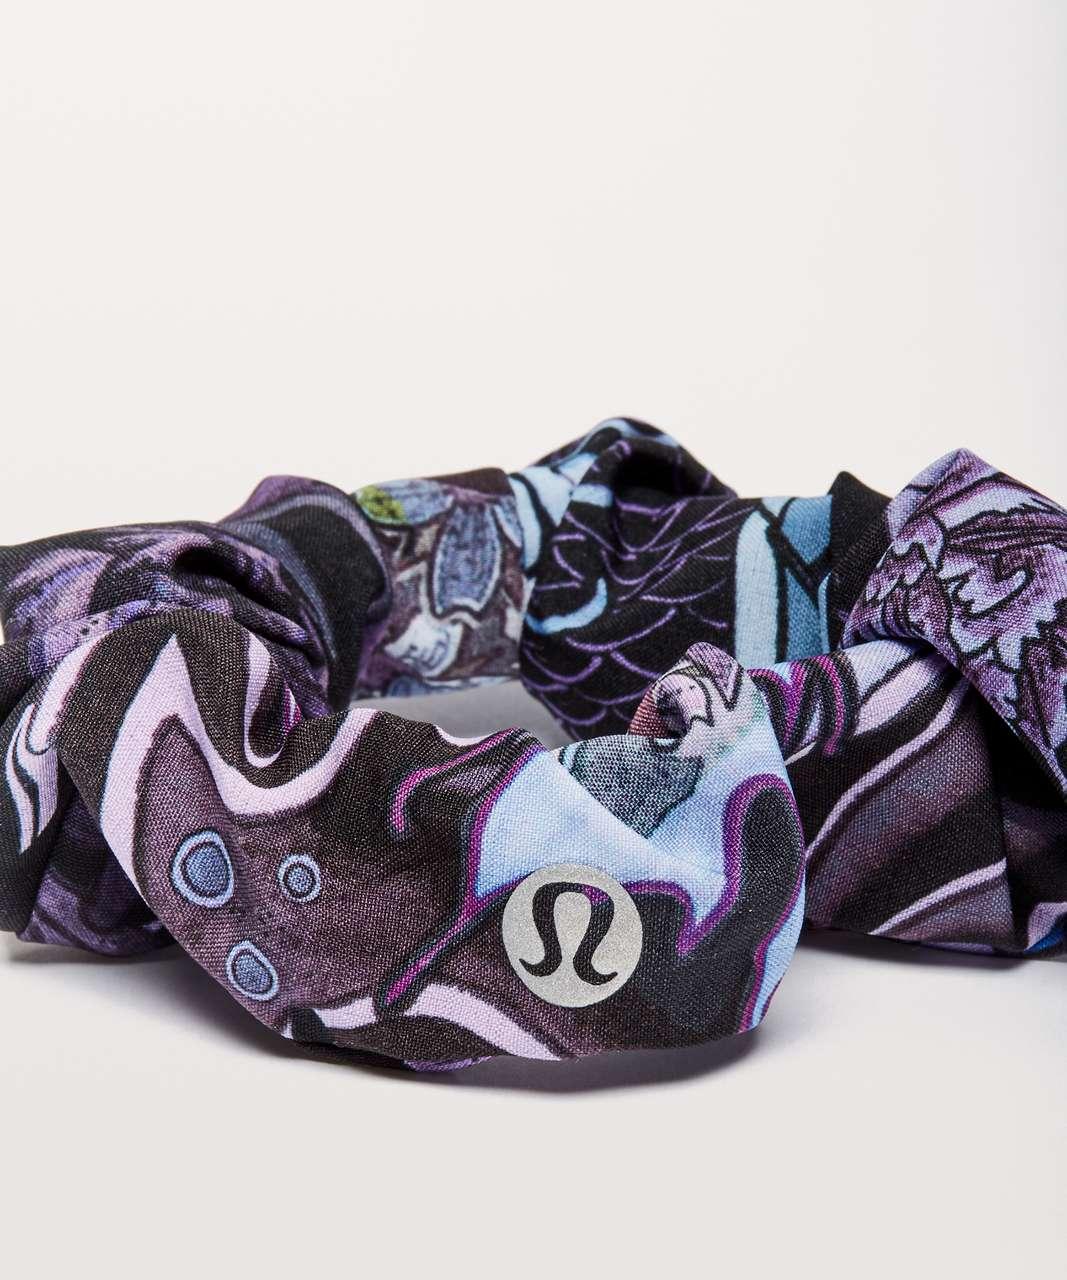 Lululemon Uplifting Scrunchie - Memoir Multi Purple